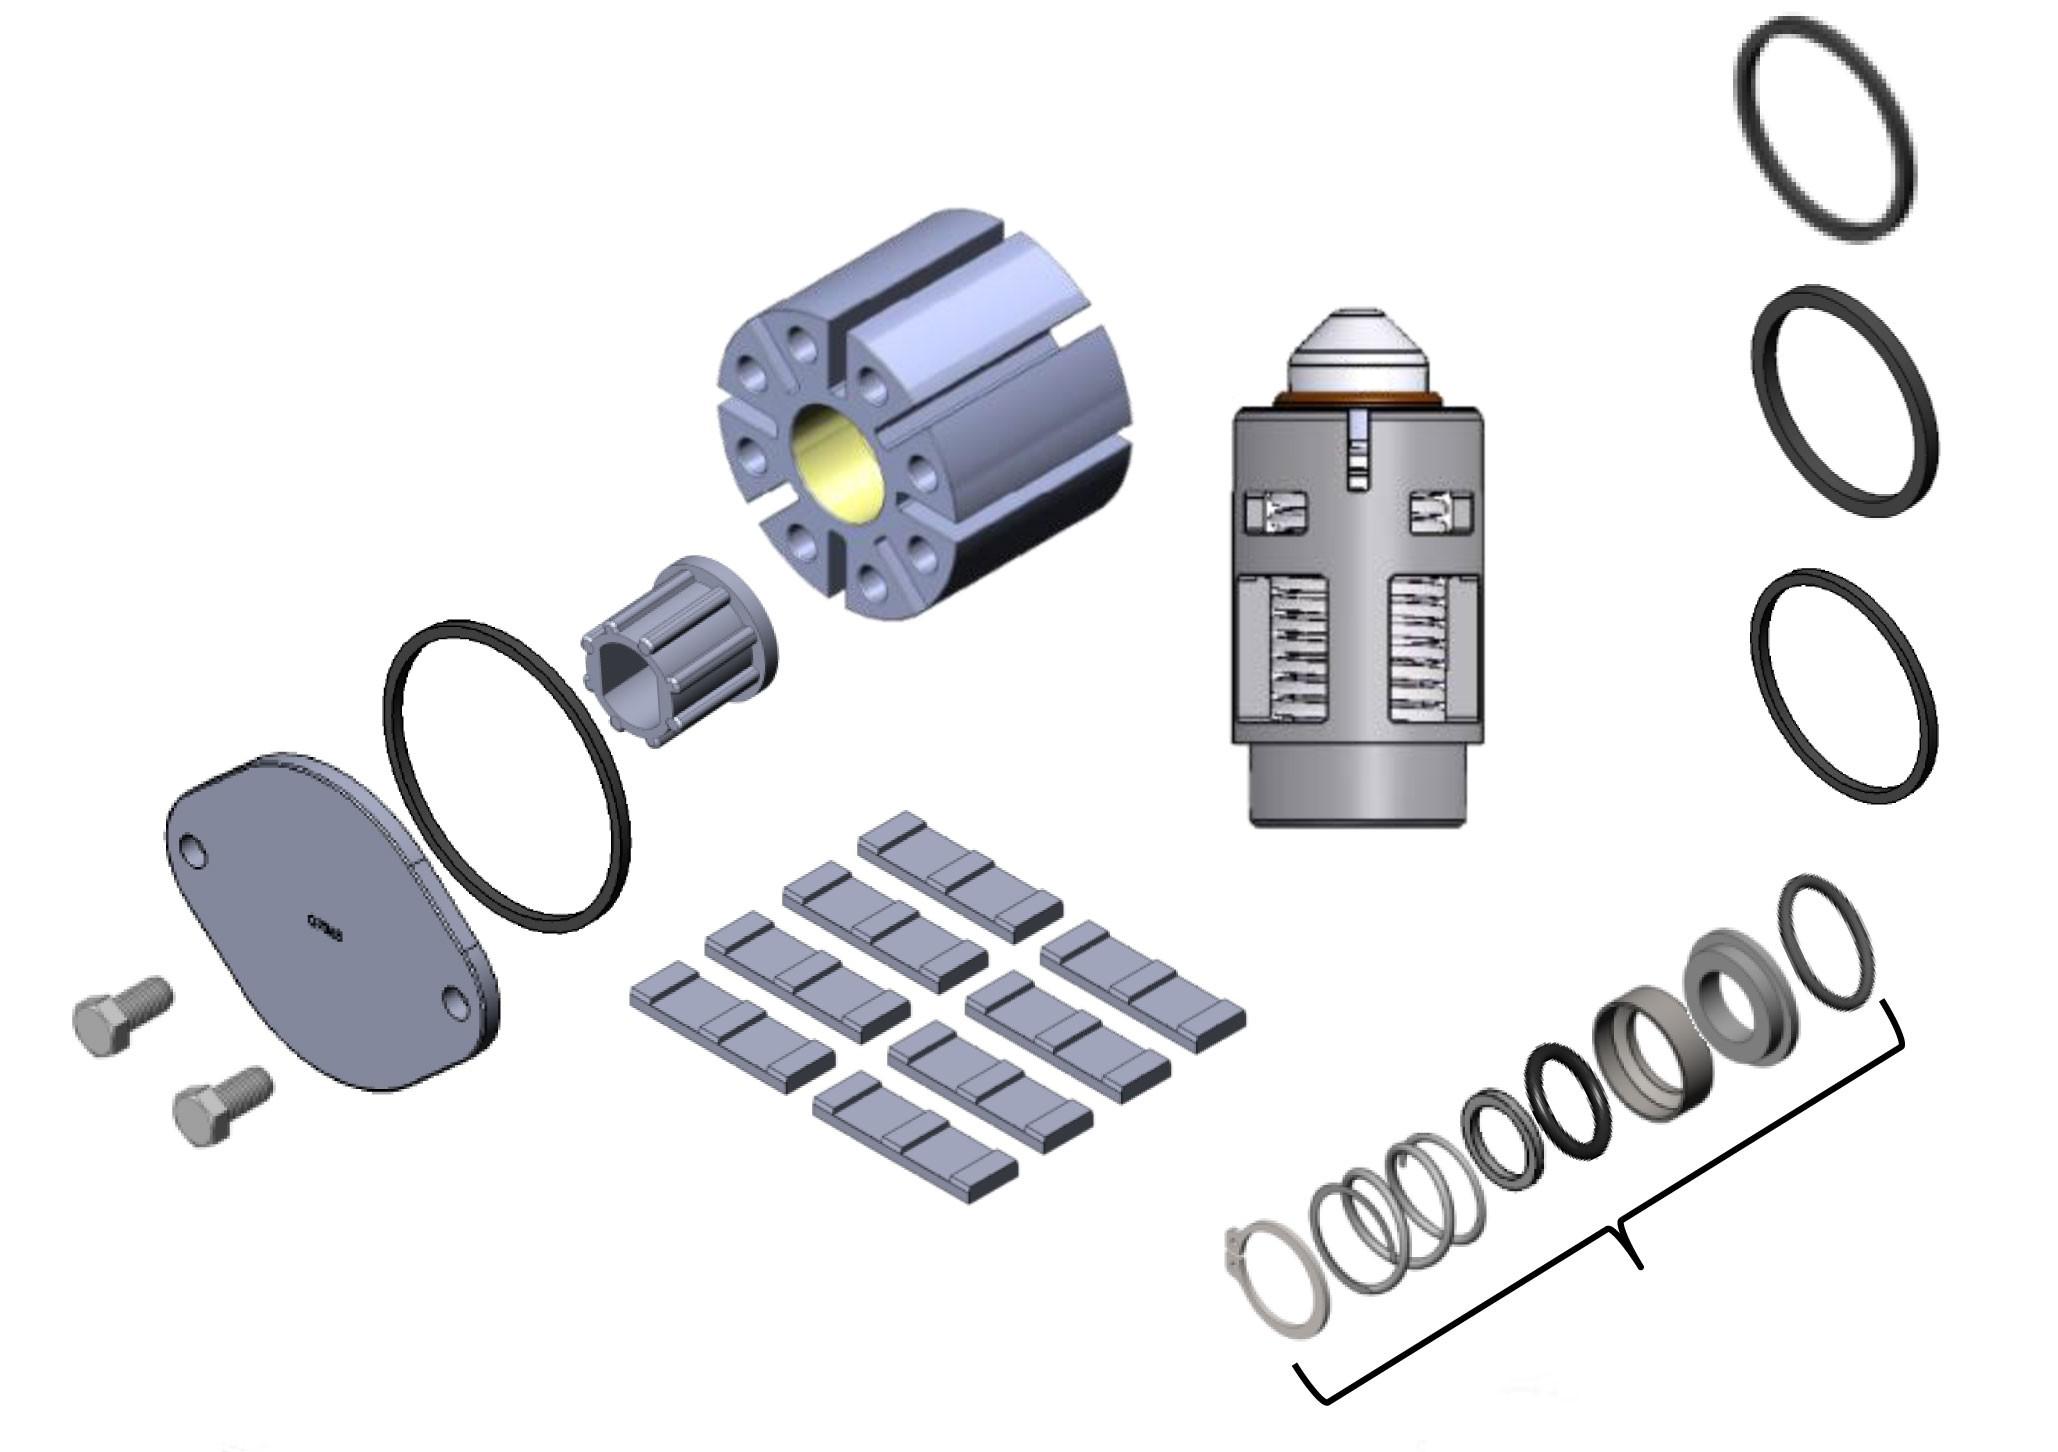 Fill-Rite 300KTF7794 Rebuild Kit for FR300 Series Pumps